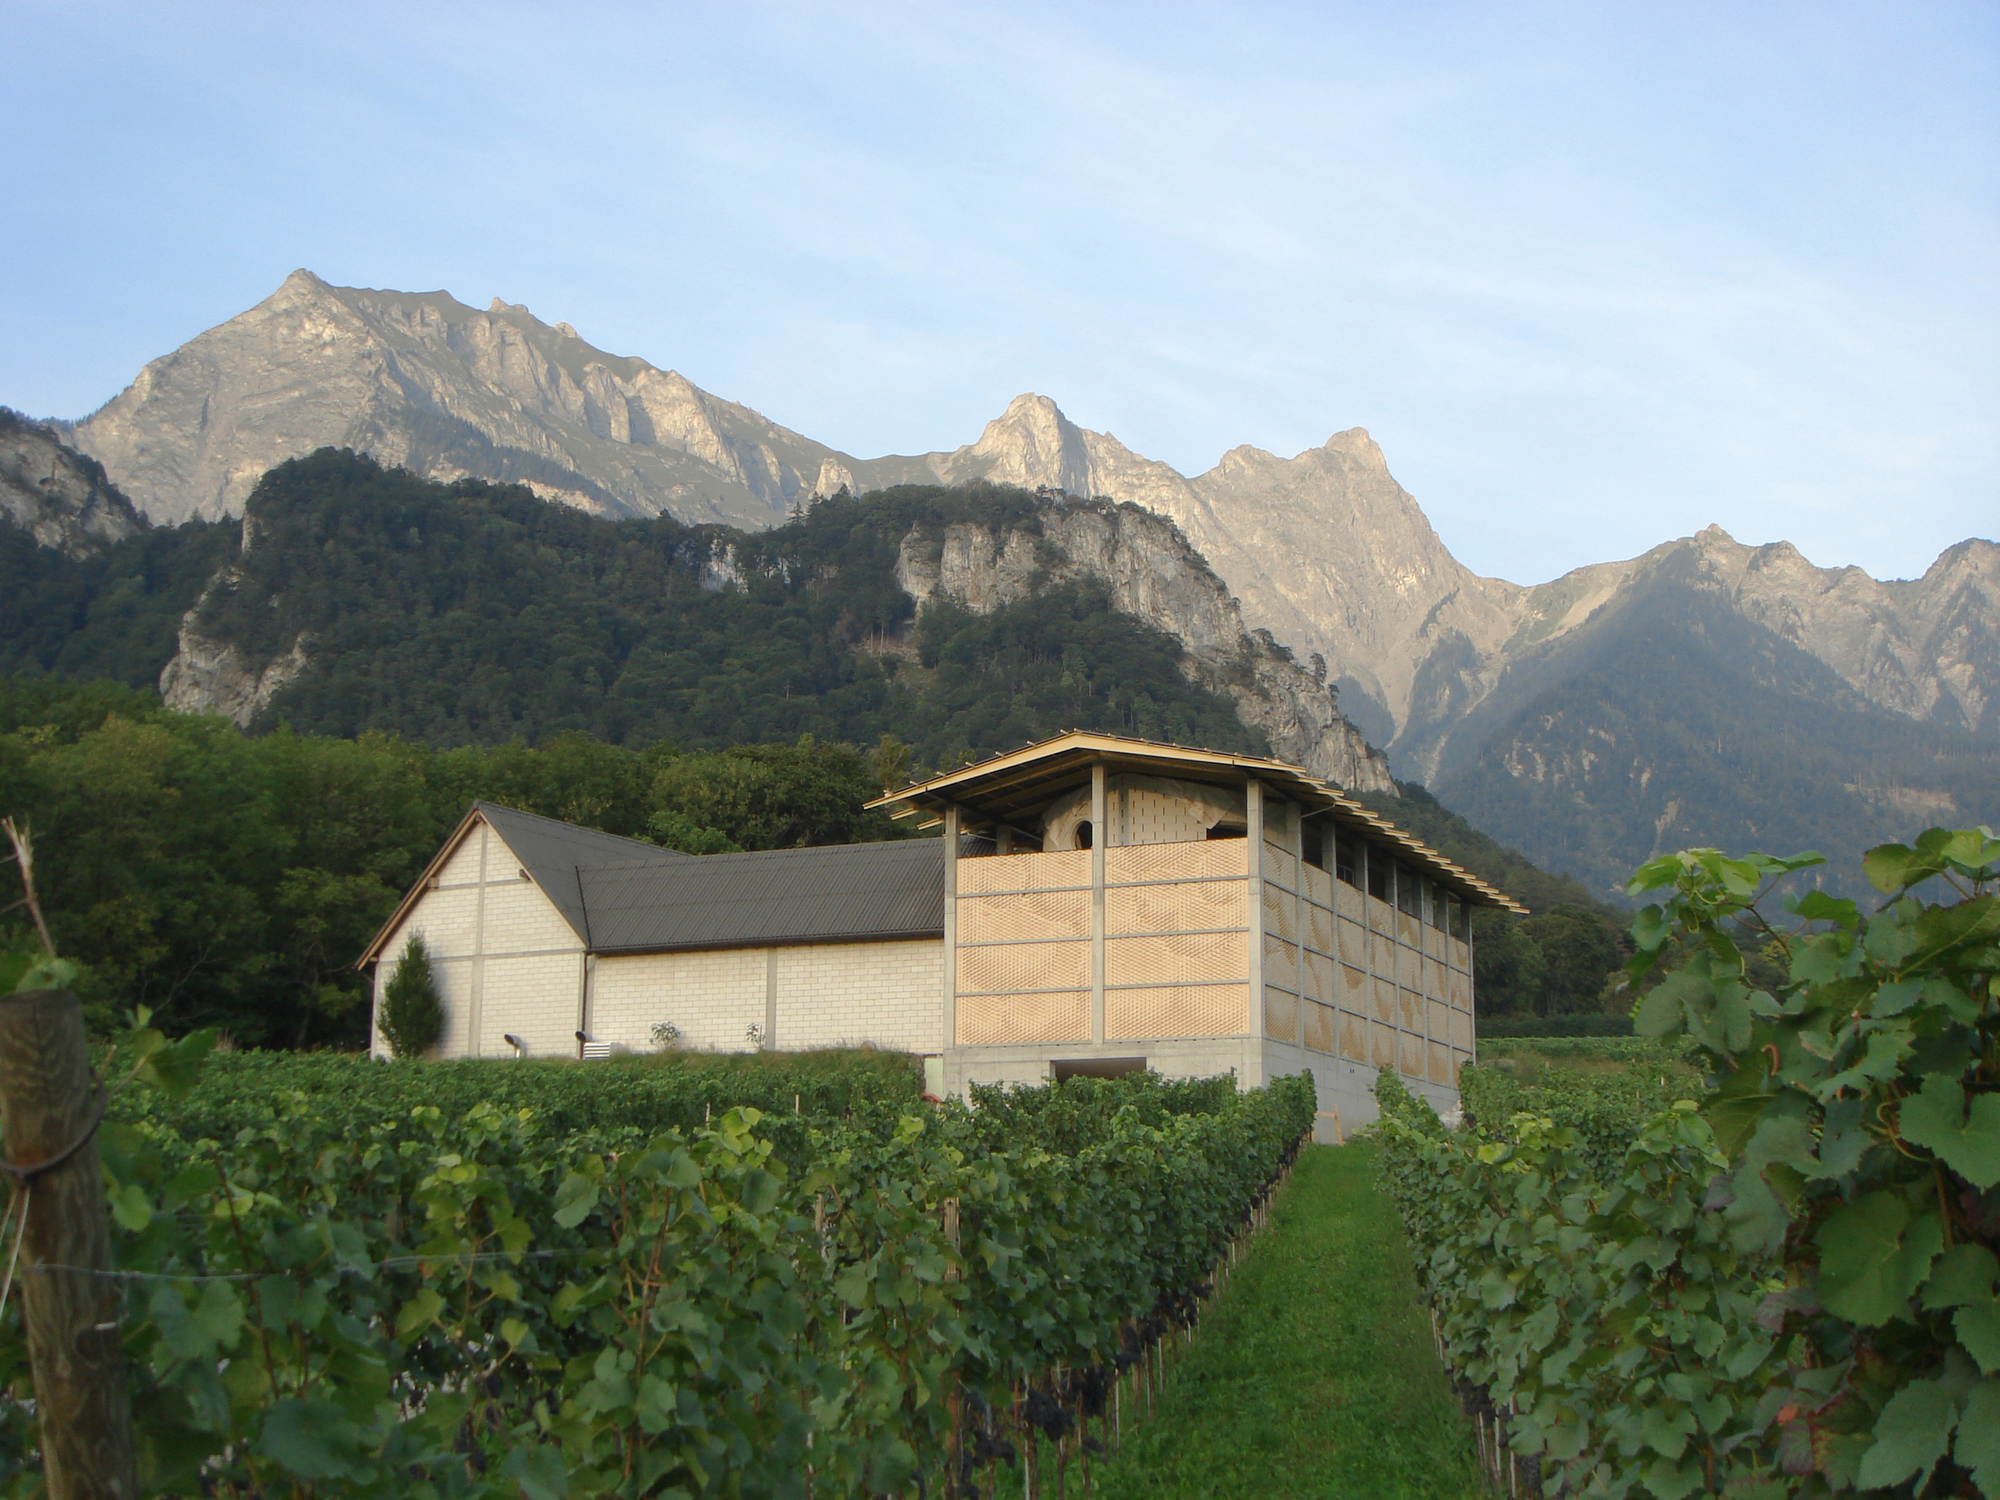 Winery Gantenbein /  Gramazio & Kohler + Bearth & Deplazes Architekten, © Gramazio & Kohler